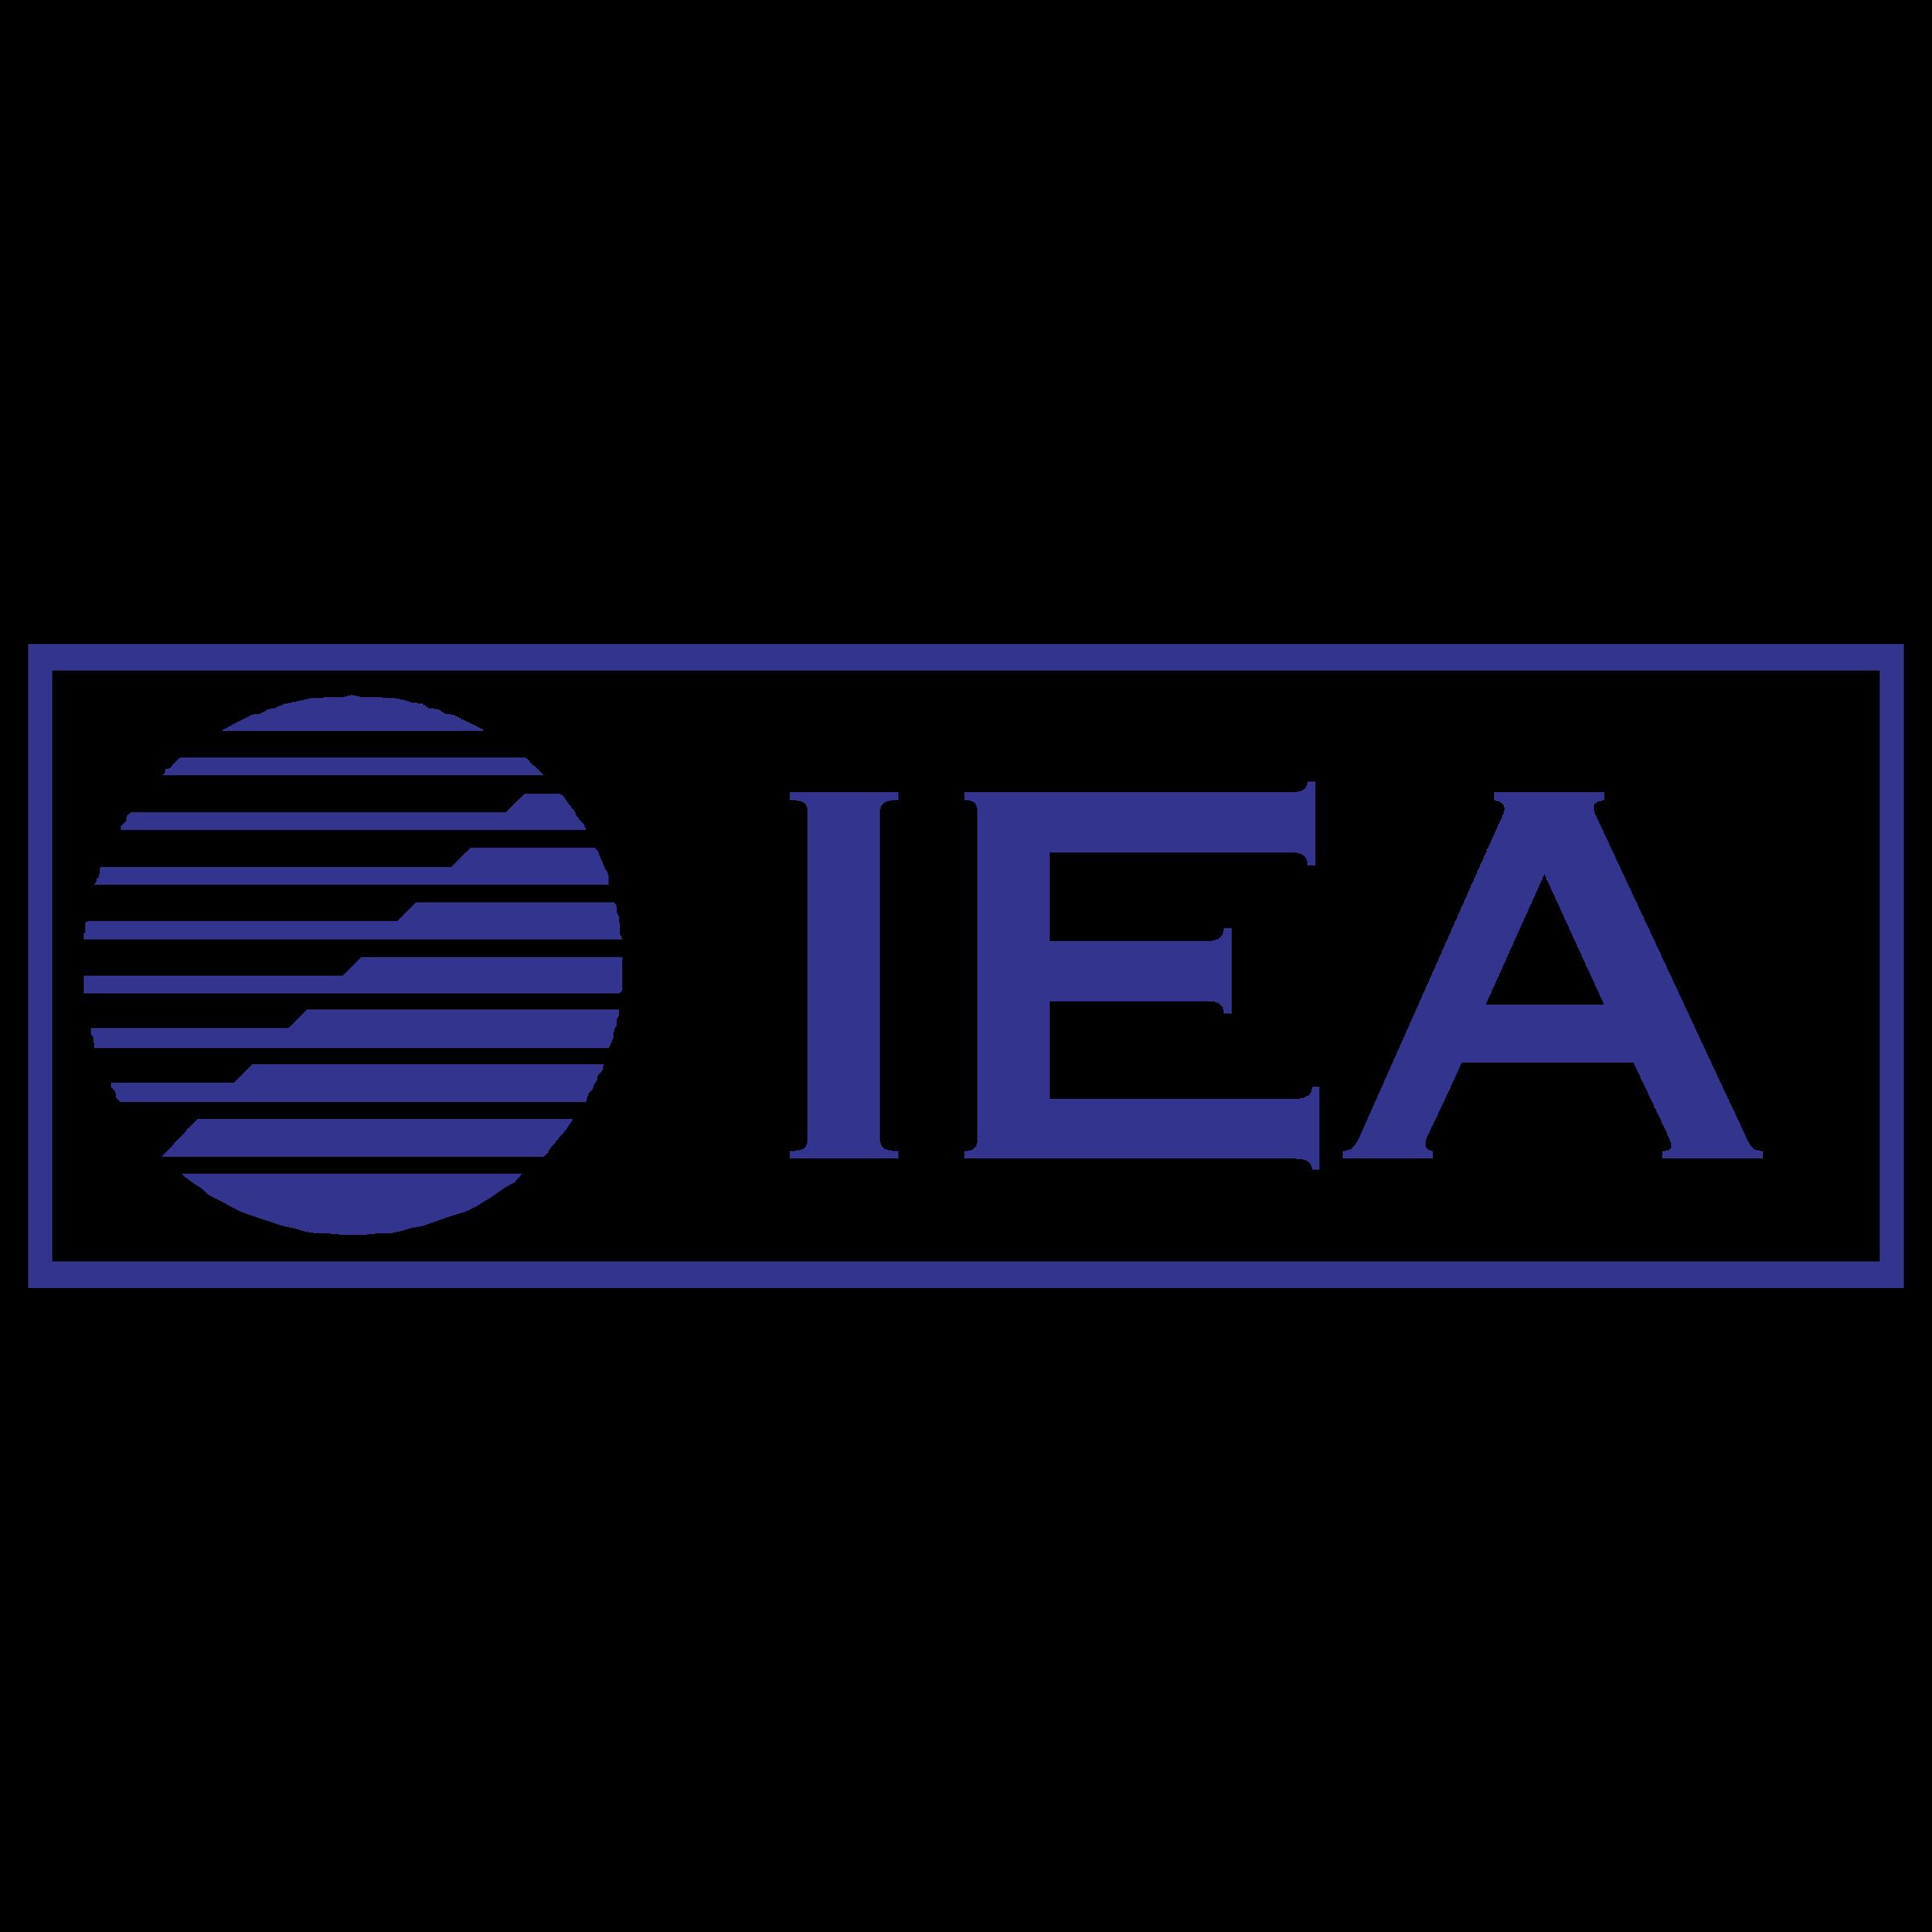 IEA Logo PNG Transparent & SVG Vector.